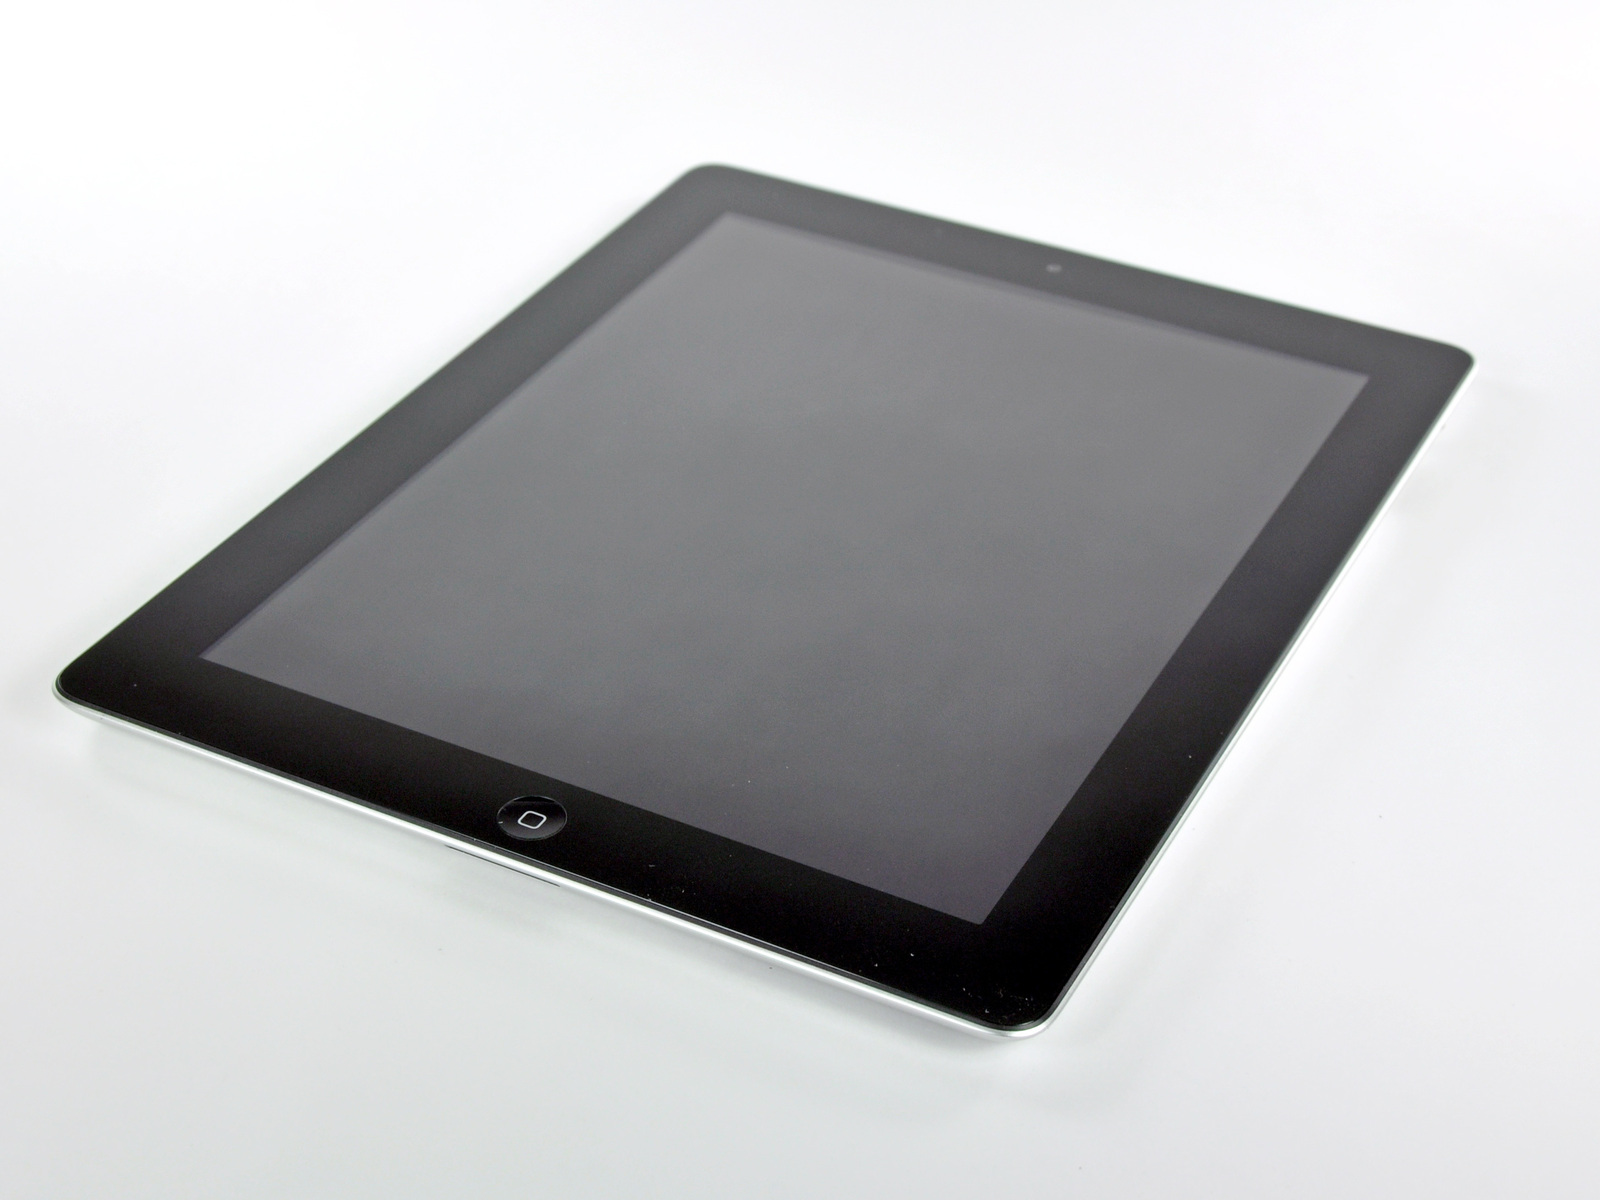 iPad 2 desmontado pela iFixit - visão geral